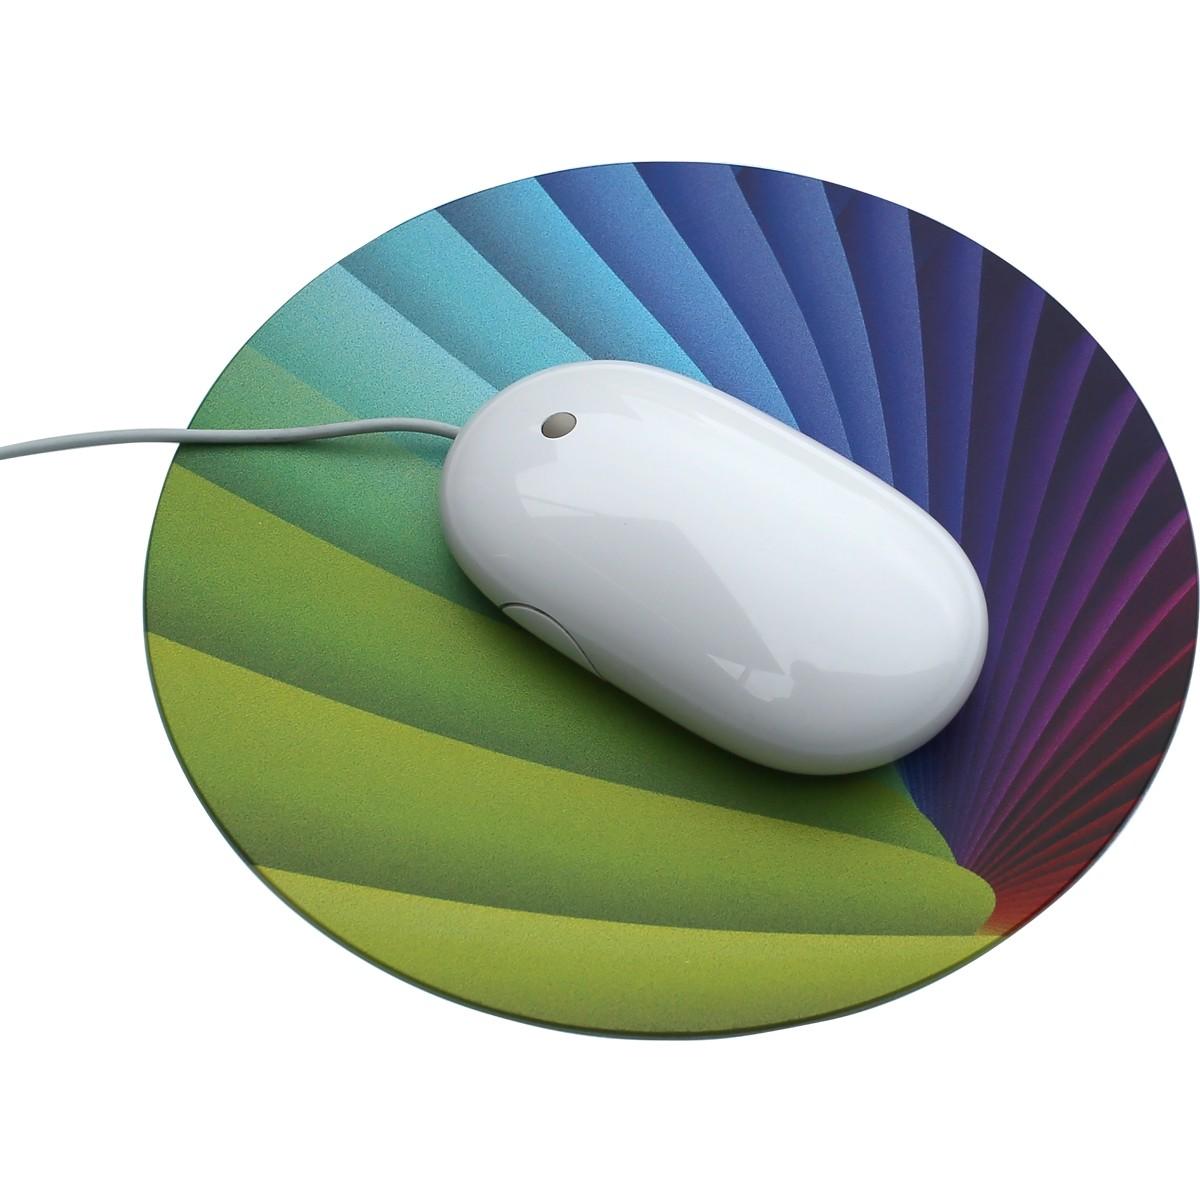 Tapis de souris QUADRO Forme ronde 20 cm de diamètre